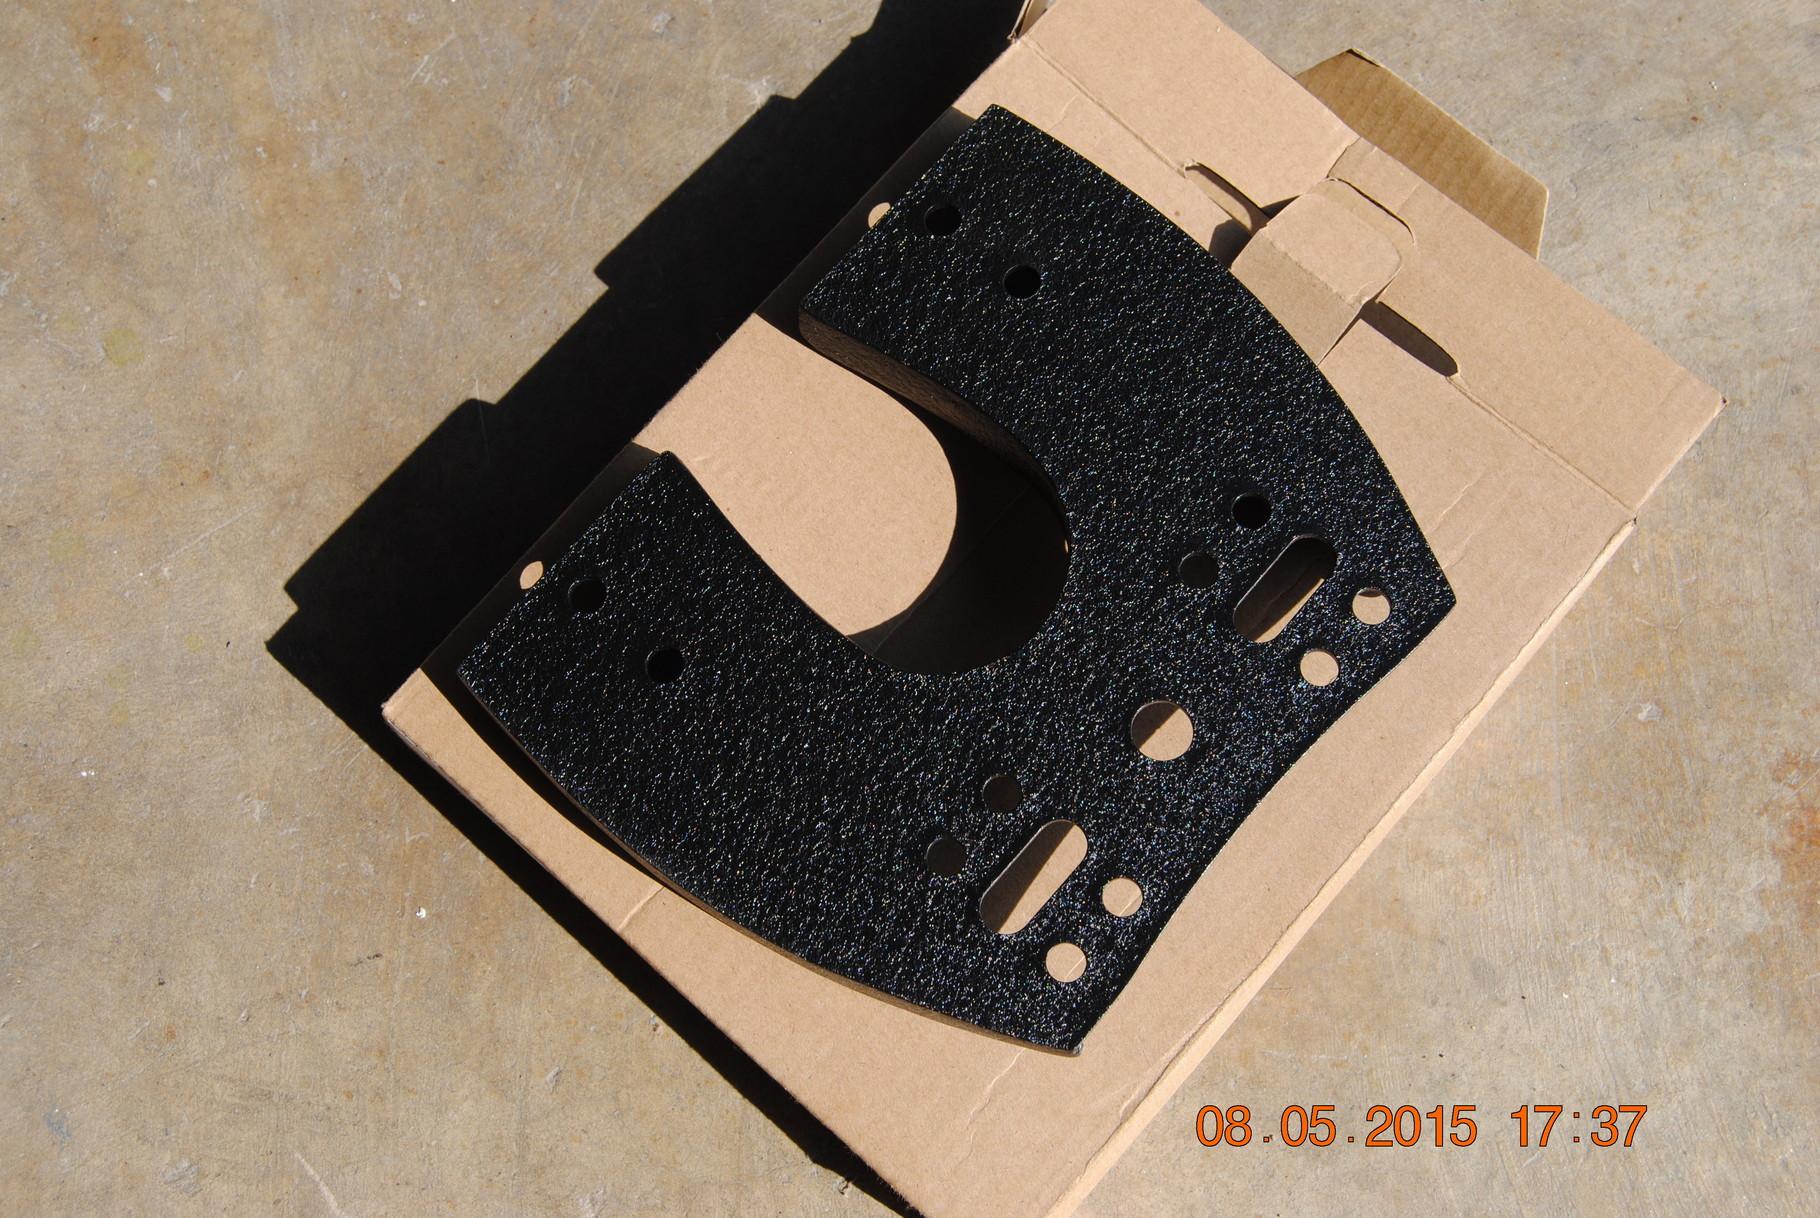 Support universel pour quad garage soa 4x4 sp cialiste for Garage 4x4 montpellier